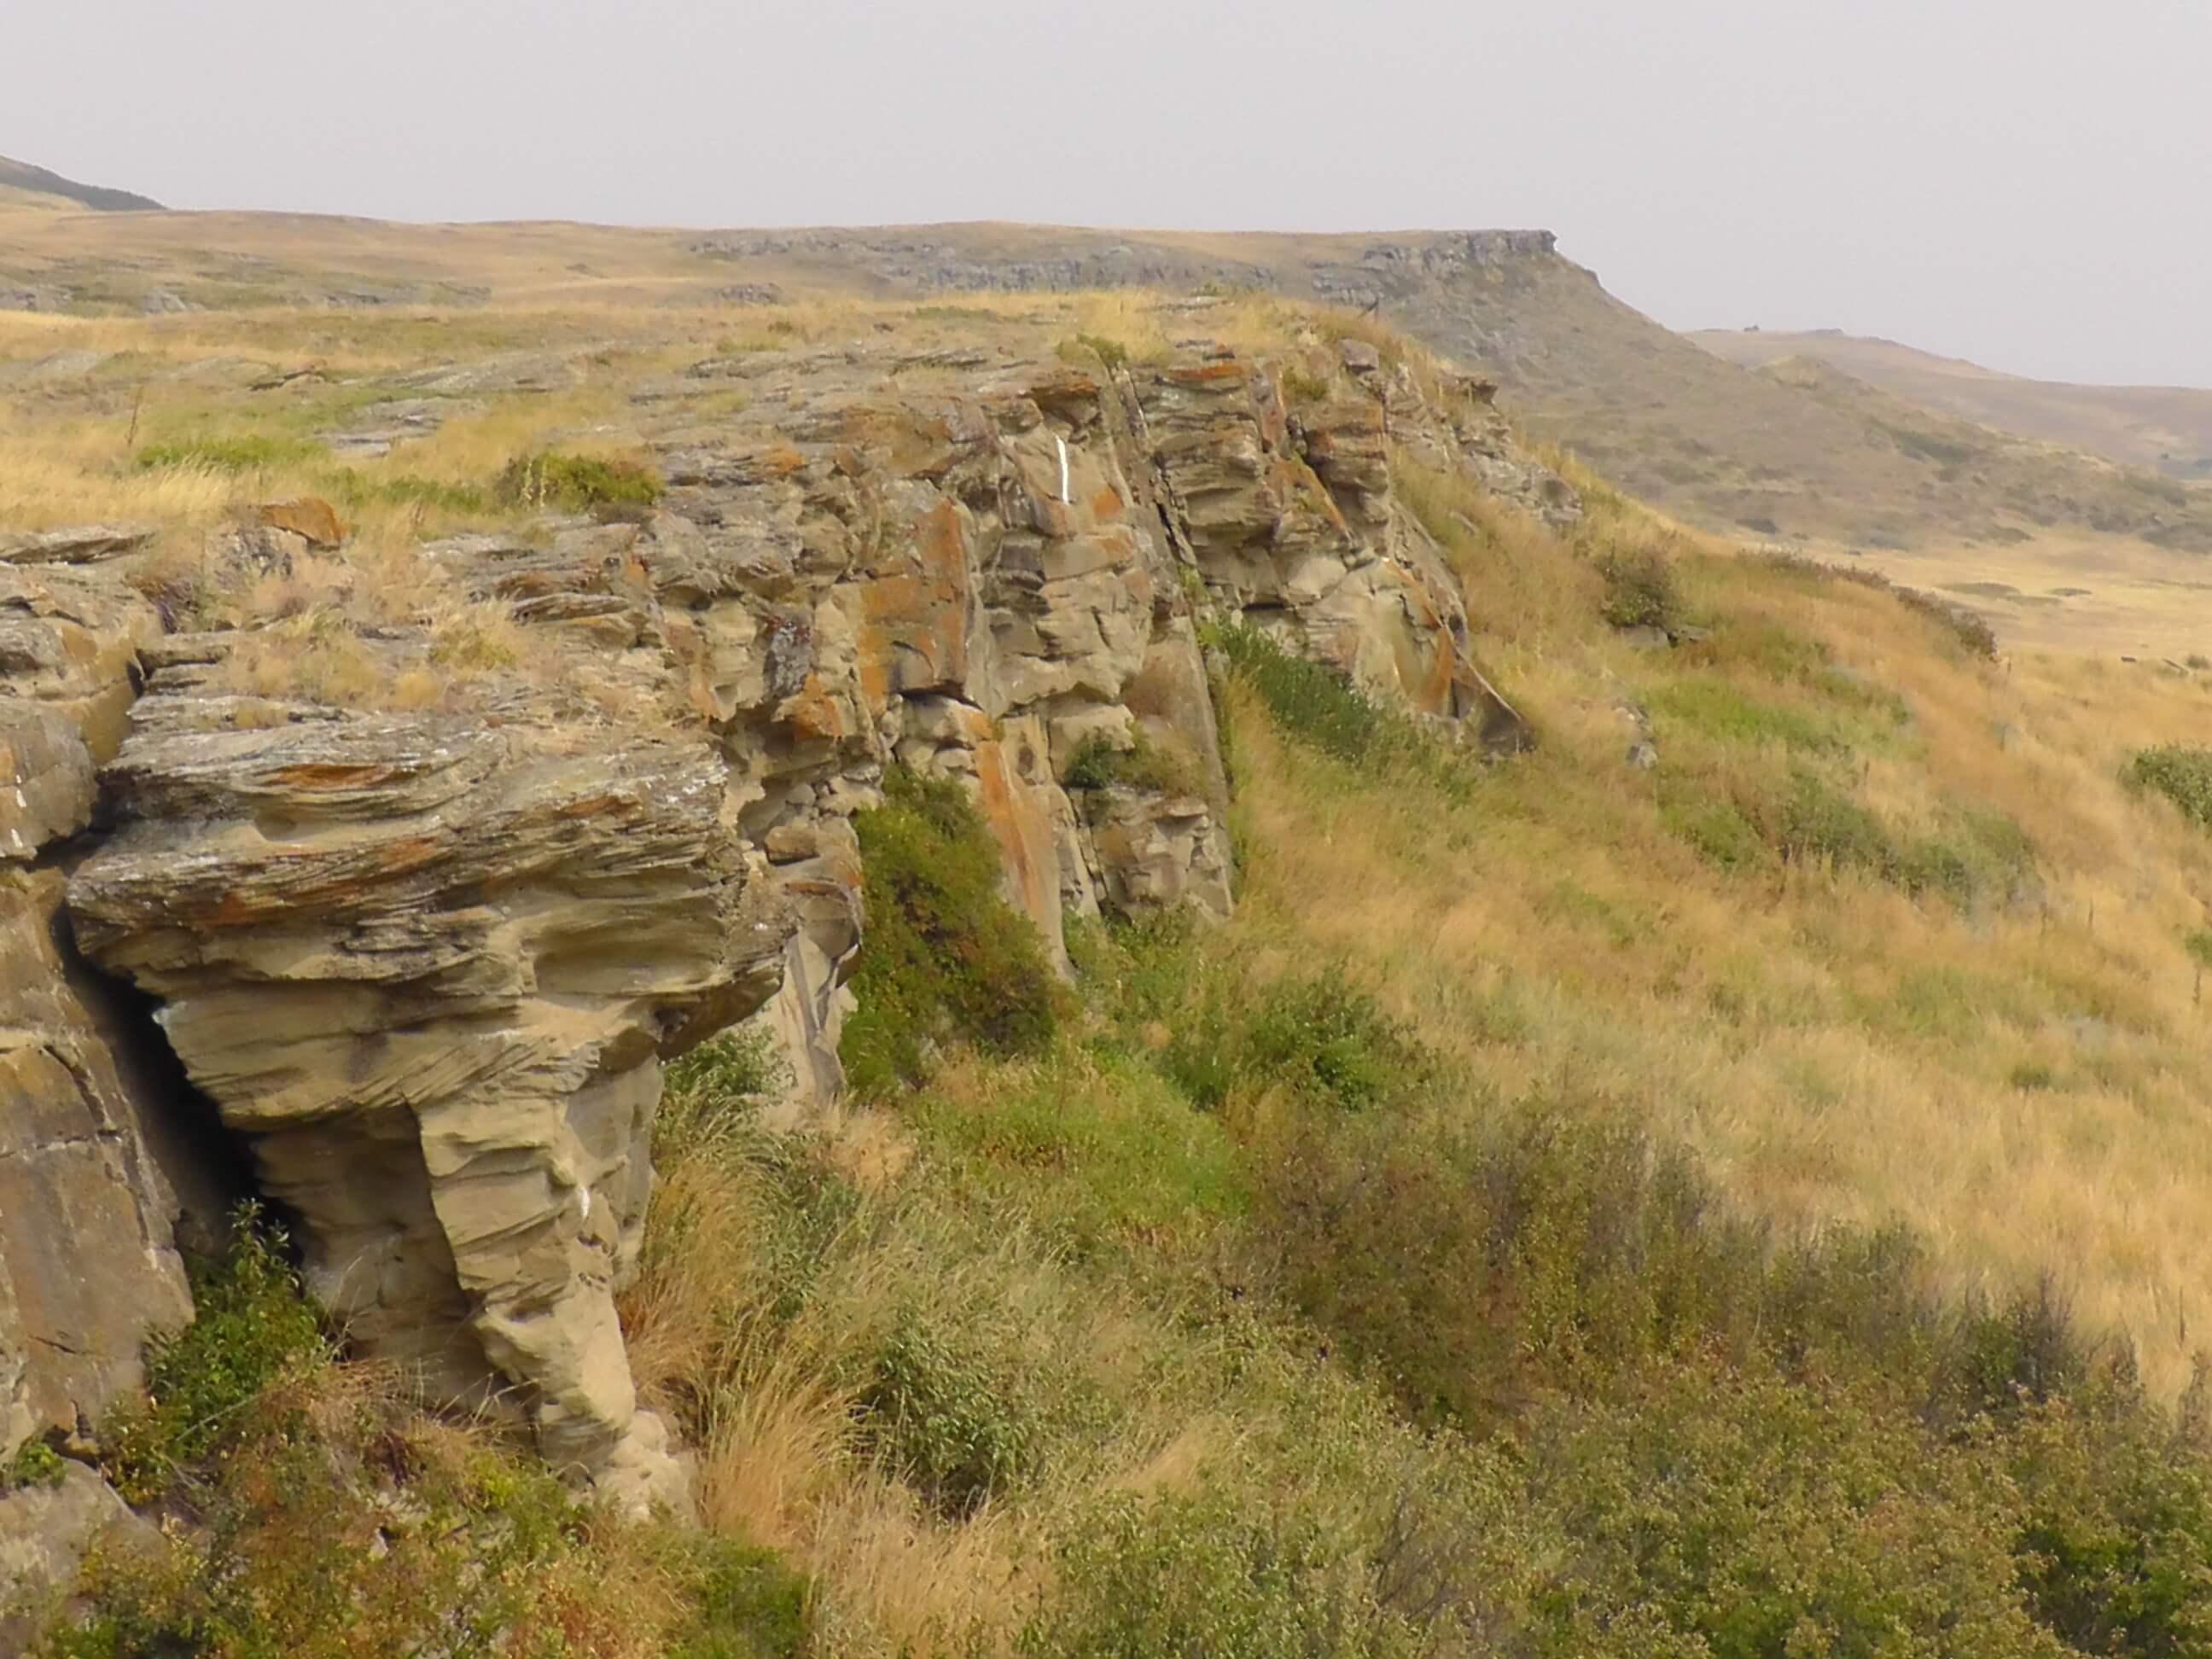 The cliff, Head-Smashed-In Buffalo Jump Interpretative Center